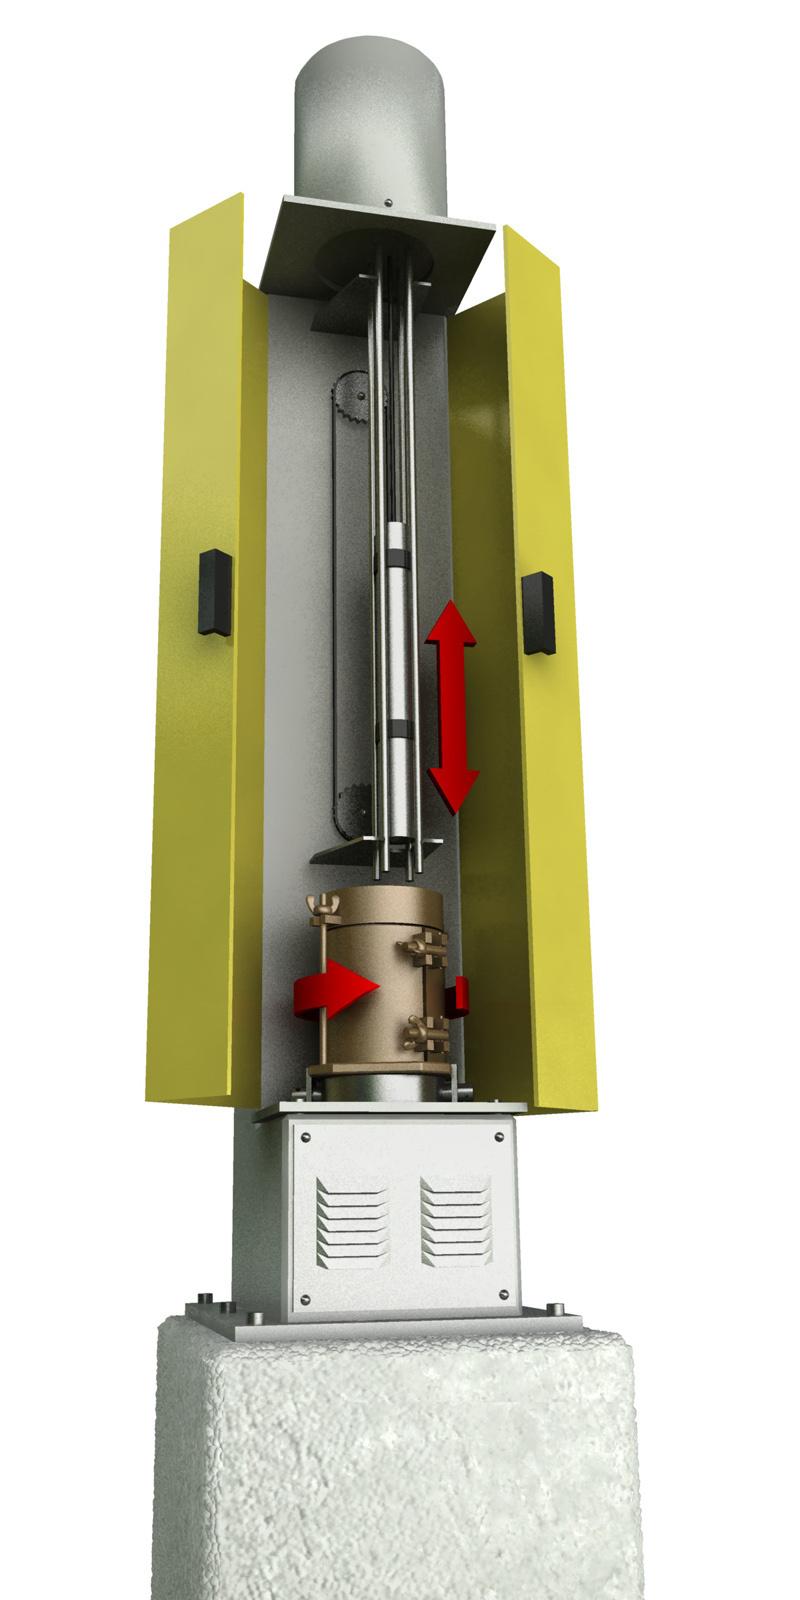 Deda proctor hammer 1 857a8974 h0vm